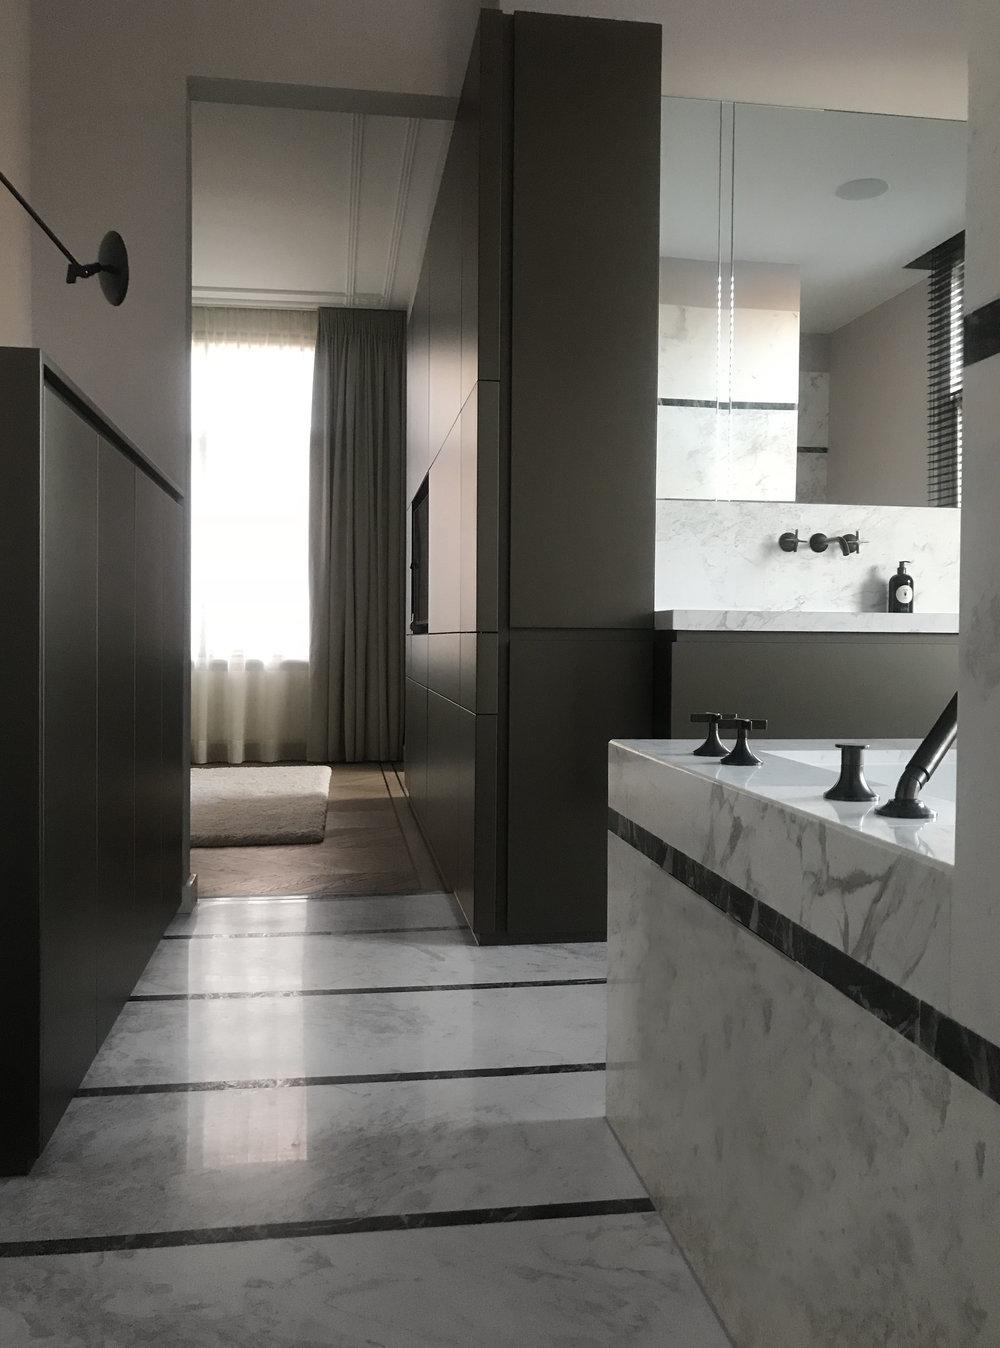 004 lex de gooijer interiors 24 bathroom design.jpg